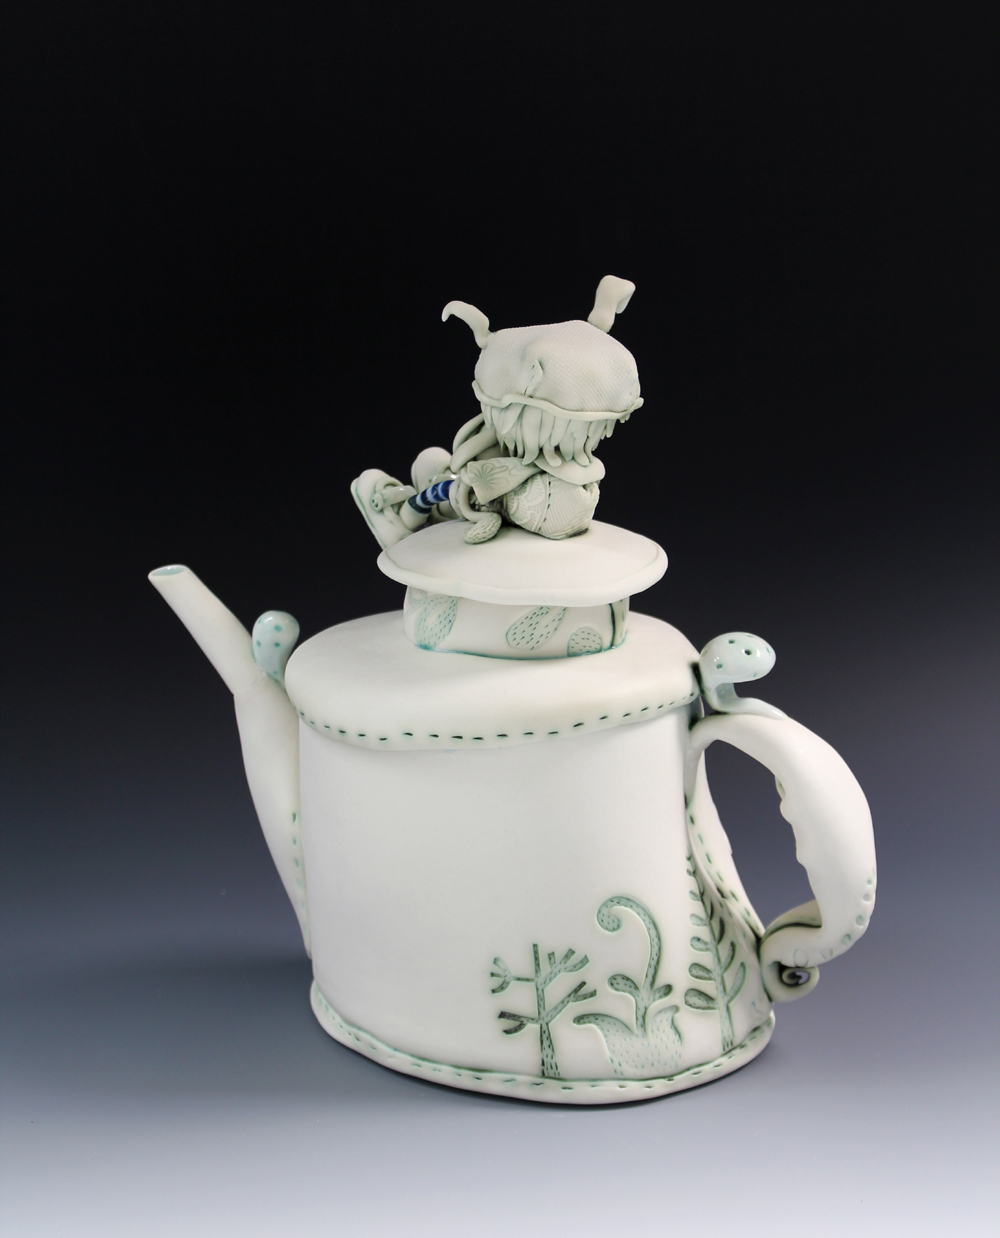 'Heidi and Bilby' porcelain teapot 2016 Fleur Schell reverse.jpg low res.jpg